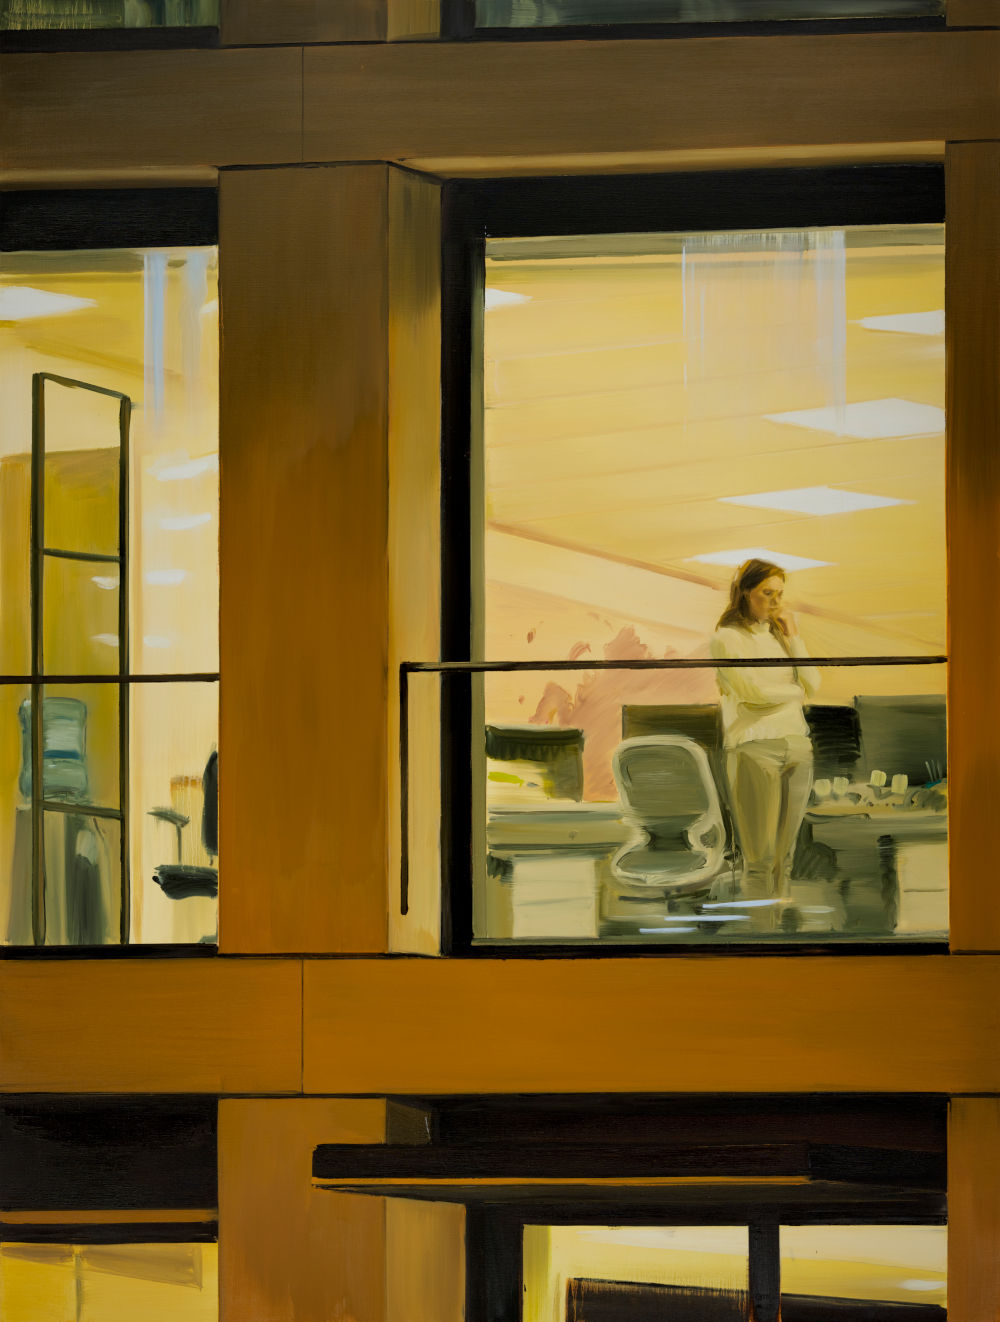 Caroline Walker, Empire, 2019. Oil on linen 240 x 180 cm 94 1/2 x 70 7/8 in © Caroline Walker. Courtesy the artist and Victoria Miro, London/Venice and GRIMM Amsterdam/ New York